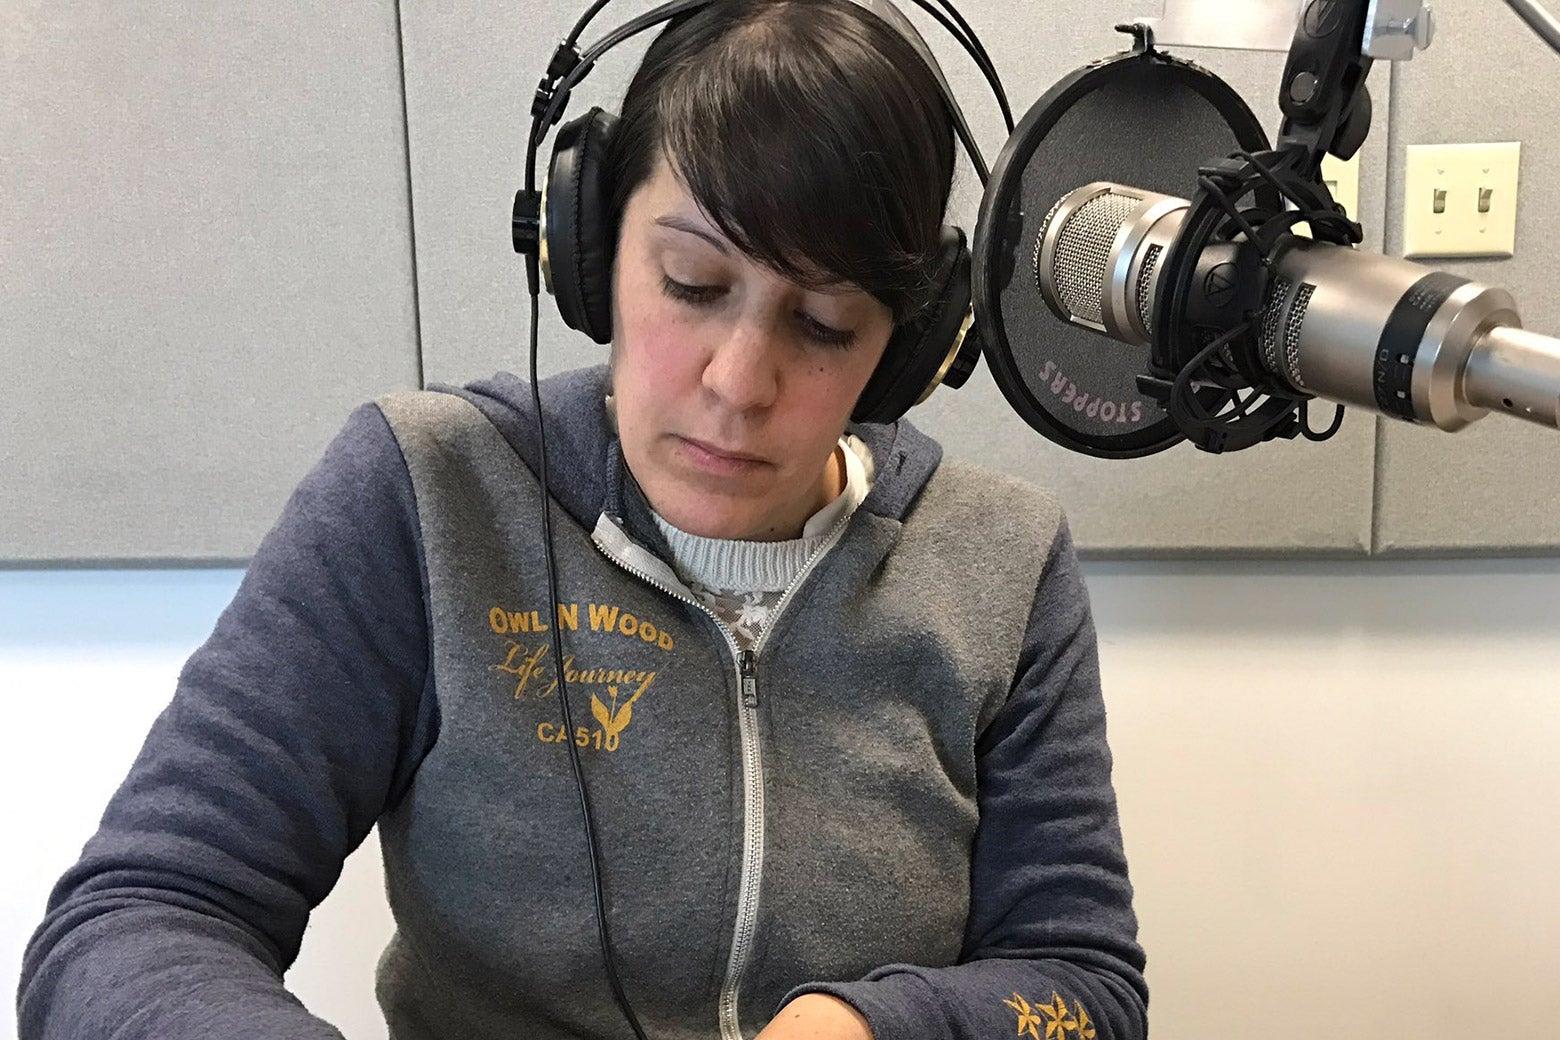 Amy Westervelt records a segment at KUNR, the local Reno NPR station.